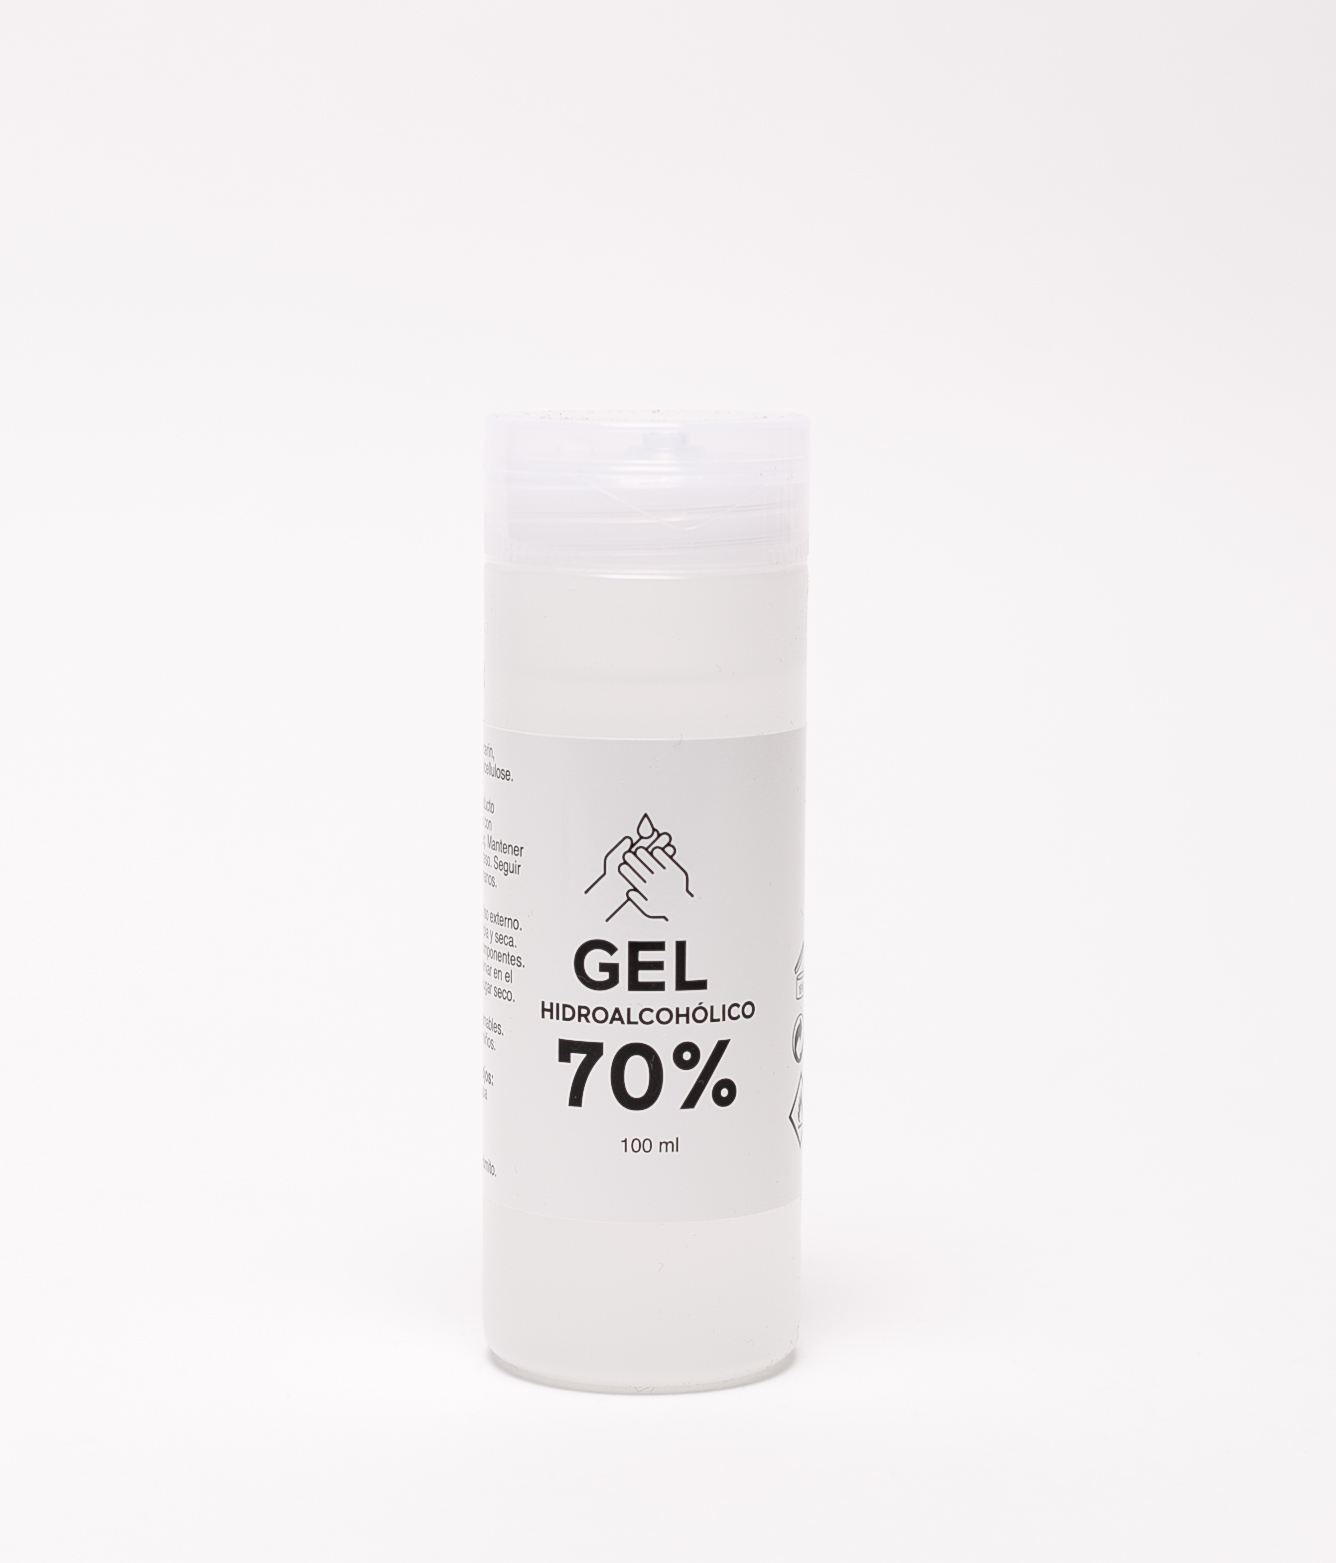 GEL HIDROALCOHÓLICO 70% - 100 ML